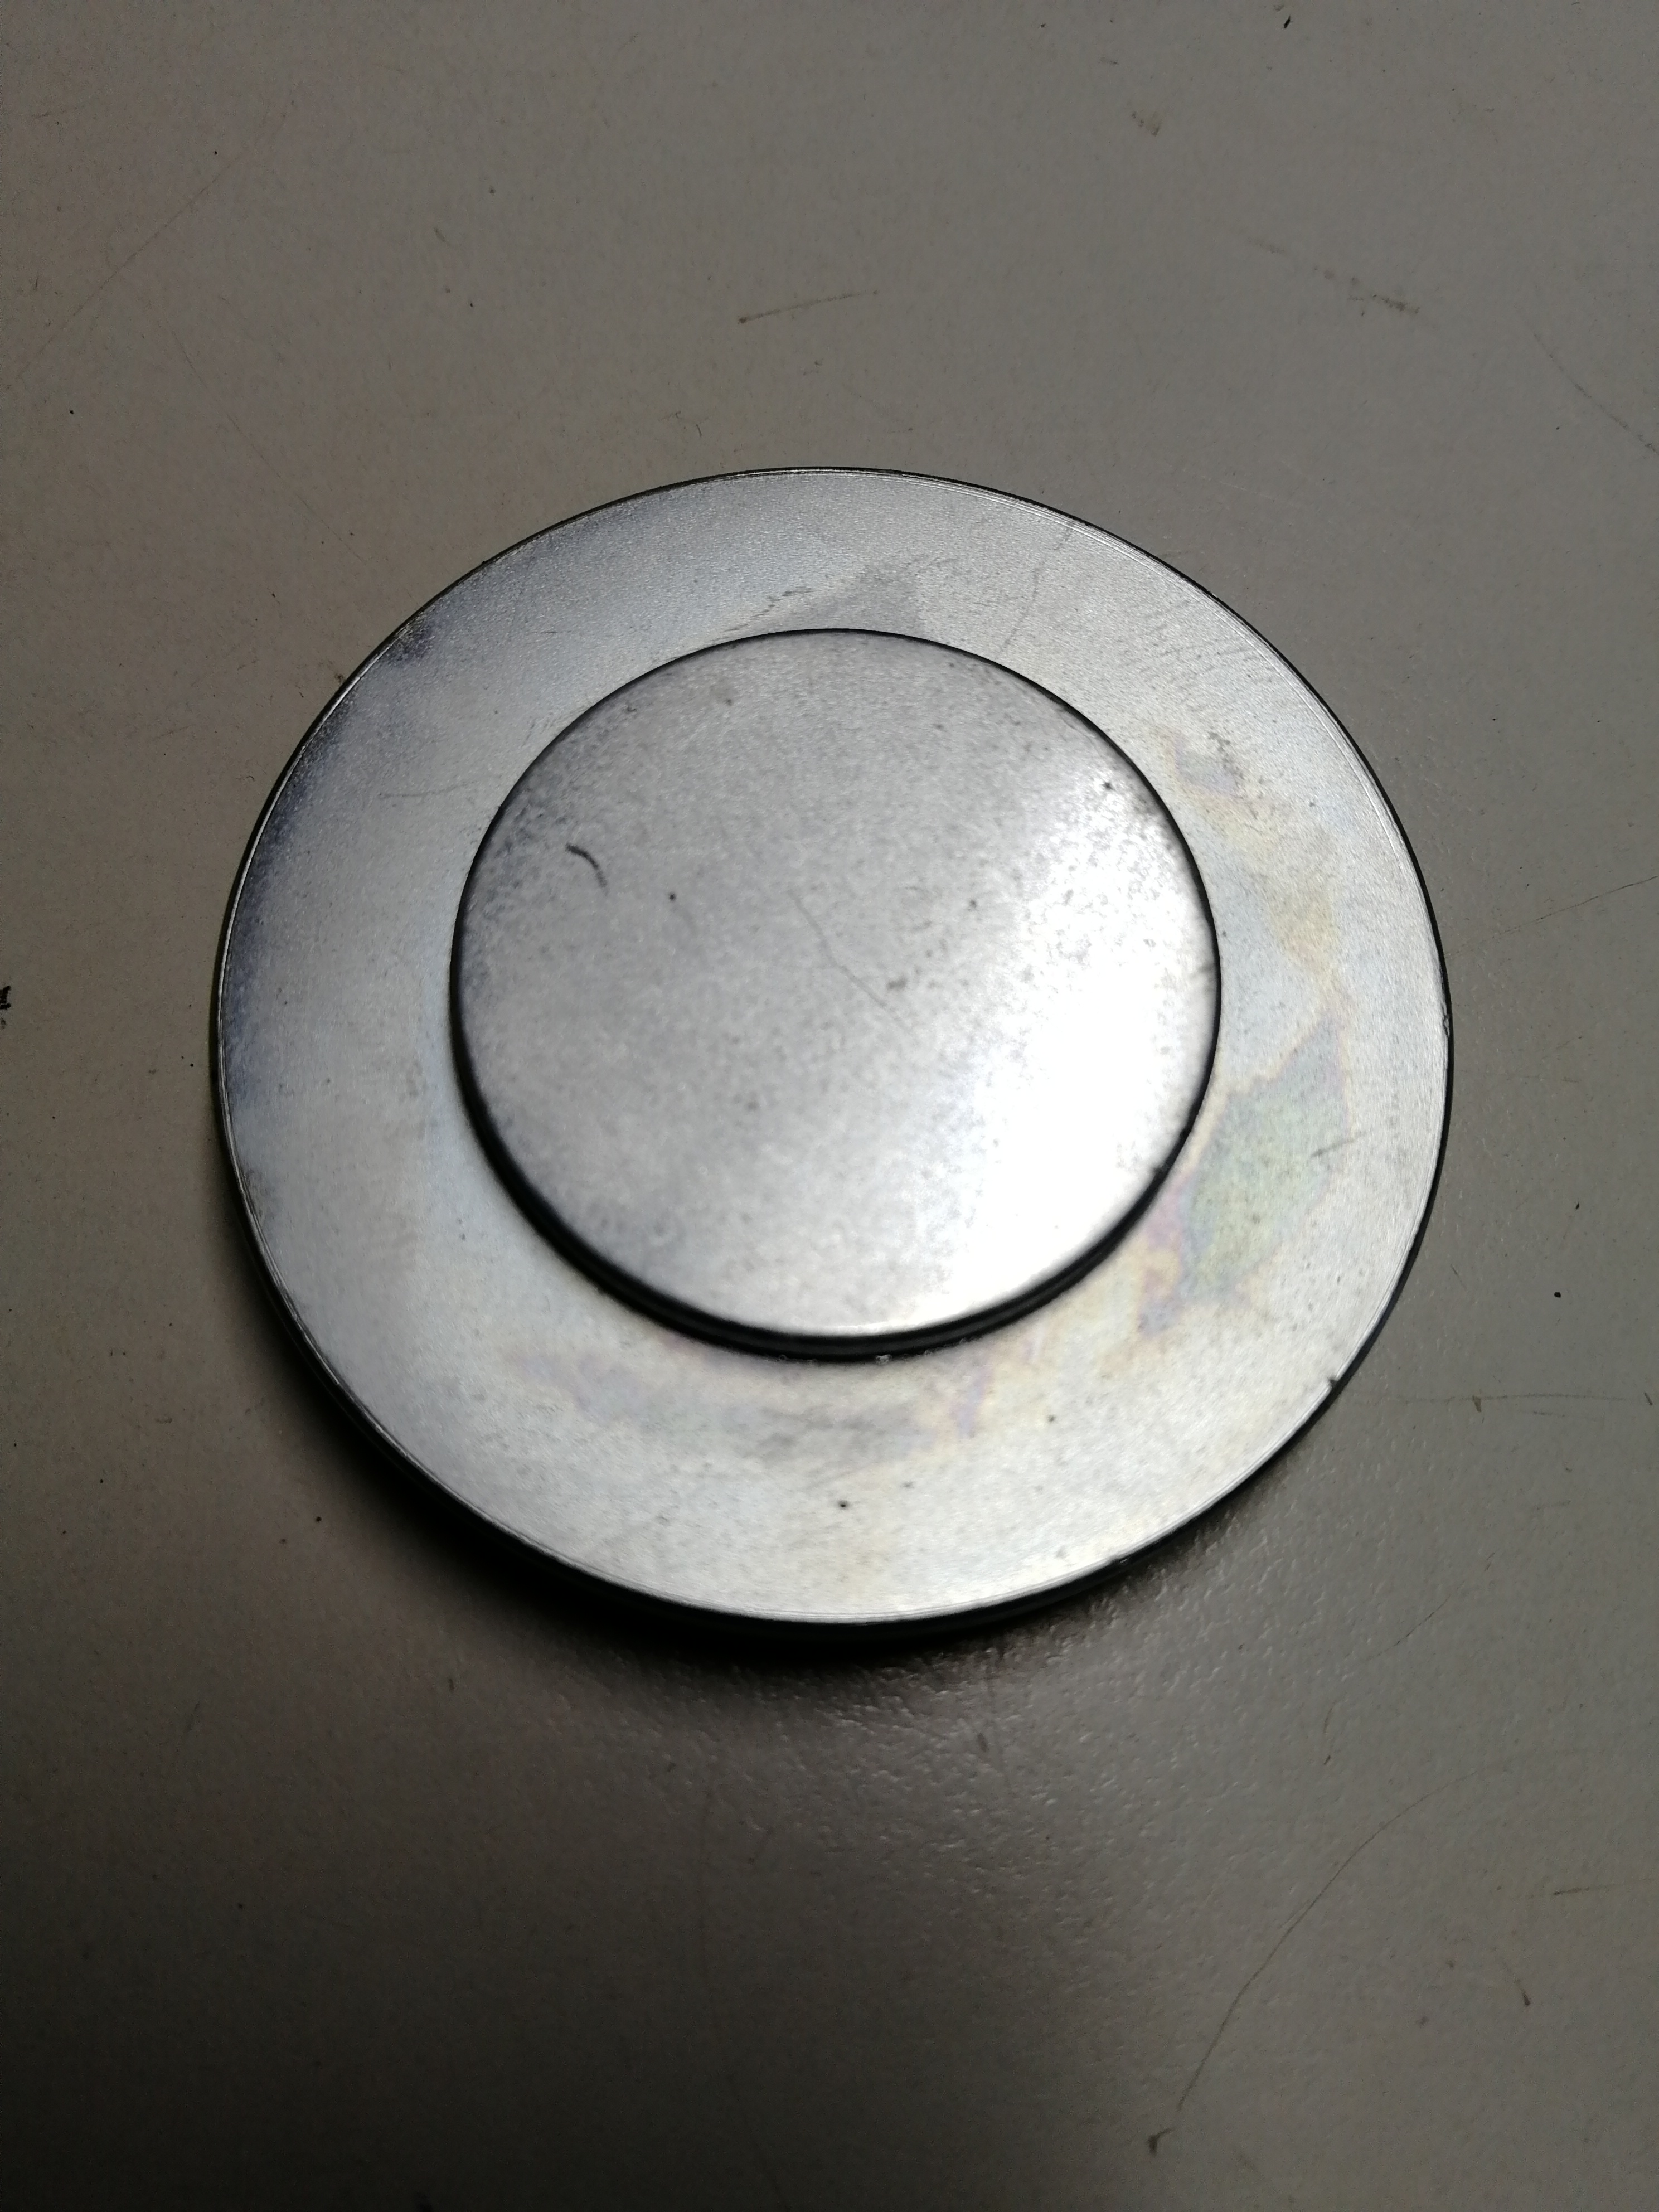 Magnetically Levitated DIY Mandrel Fittings Creative Display of Lunar Lamp GlobeMagnetically Levitated DIY Mandrel Fittings Creative Display of Lunar Lamp Globe